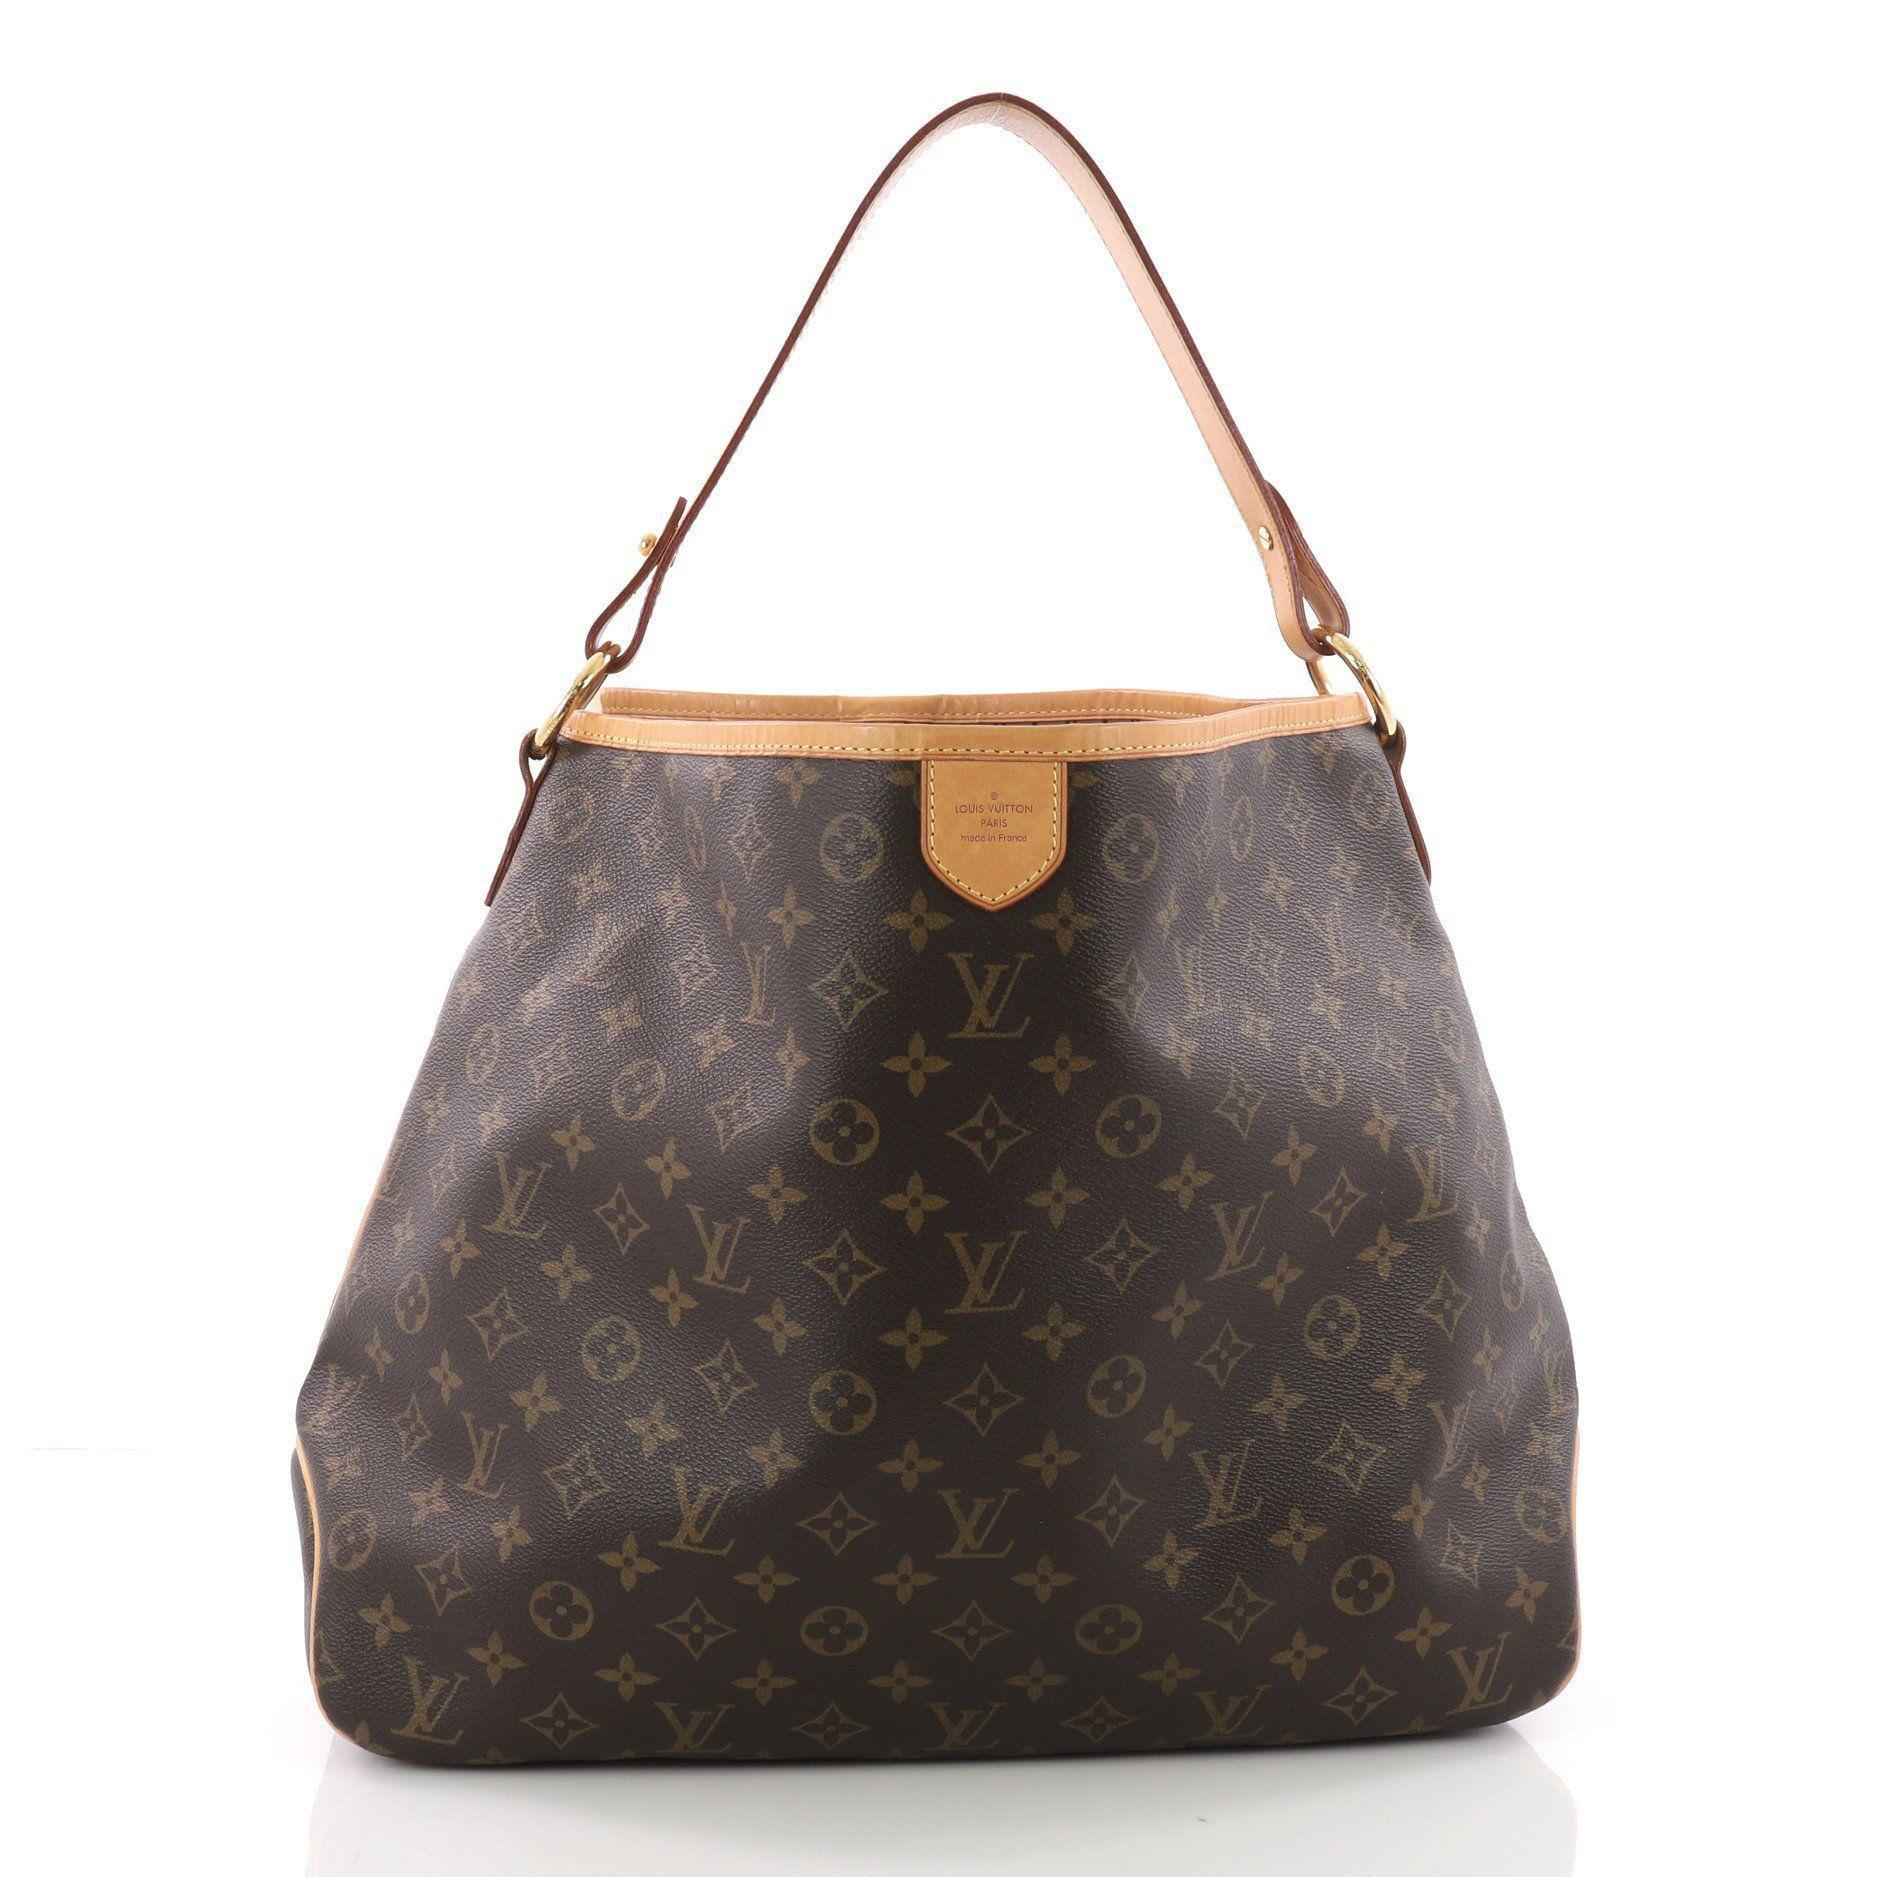 28dc15c3f09 Louis Vuitton. Women s Pre Owned Delightful Handbag Monogram Canvas Mm